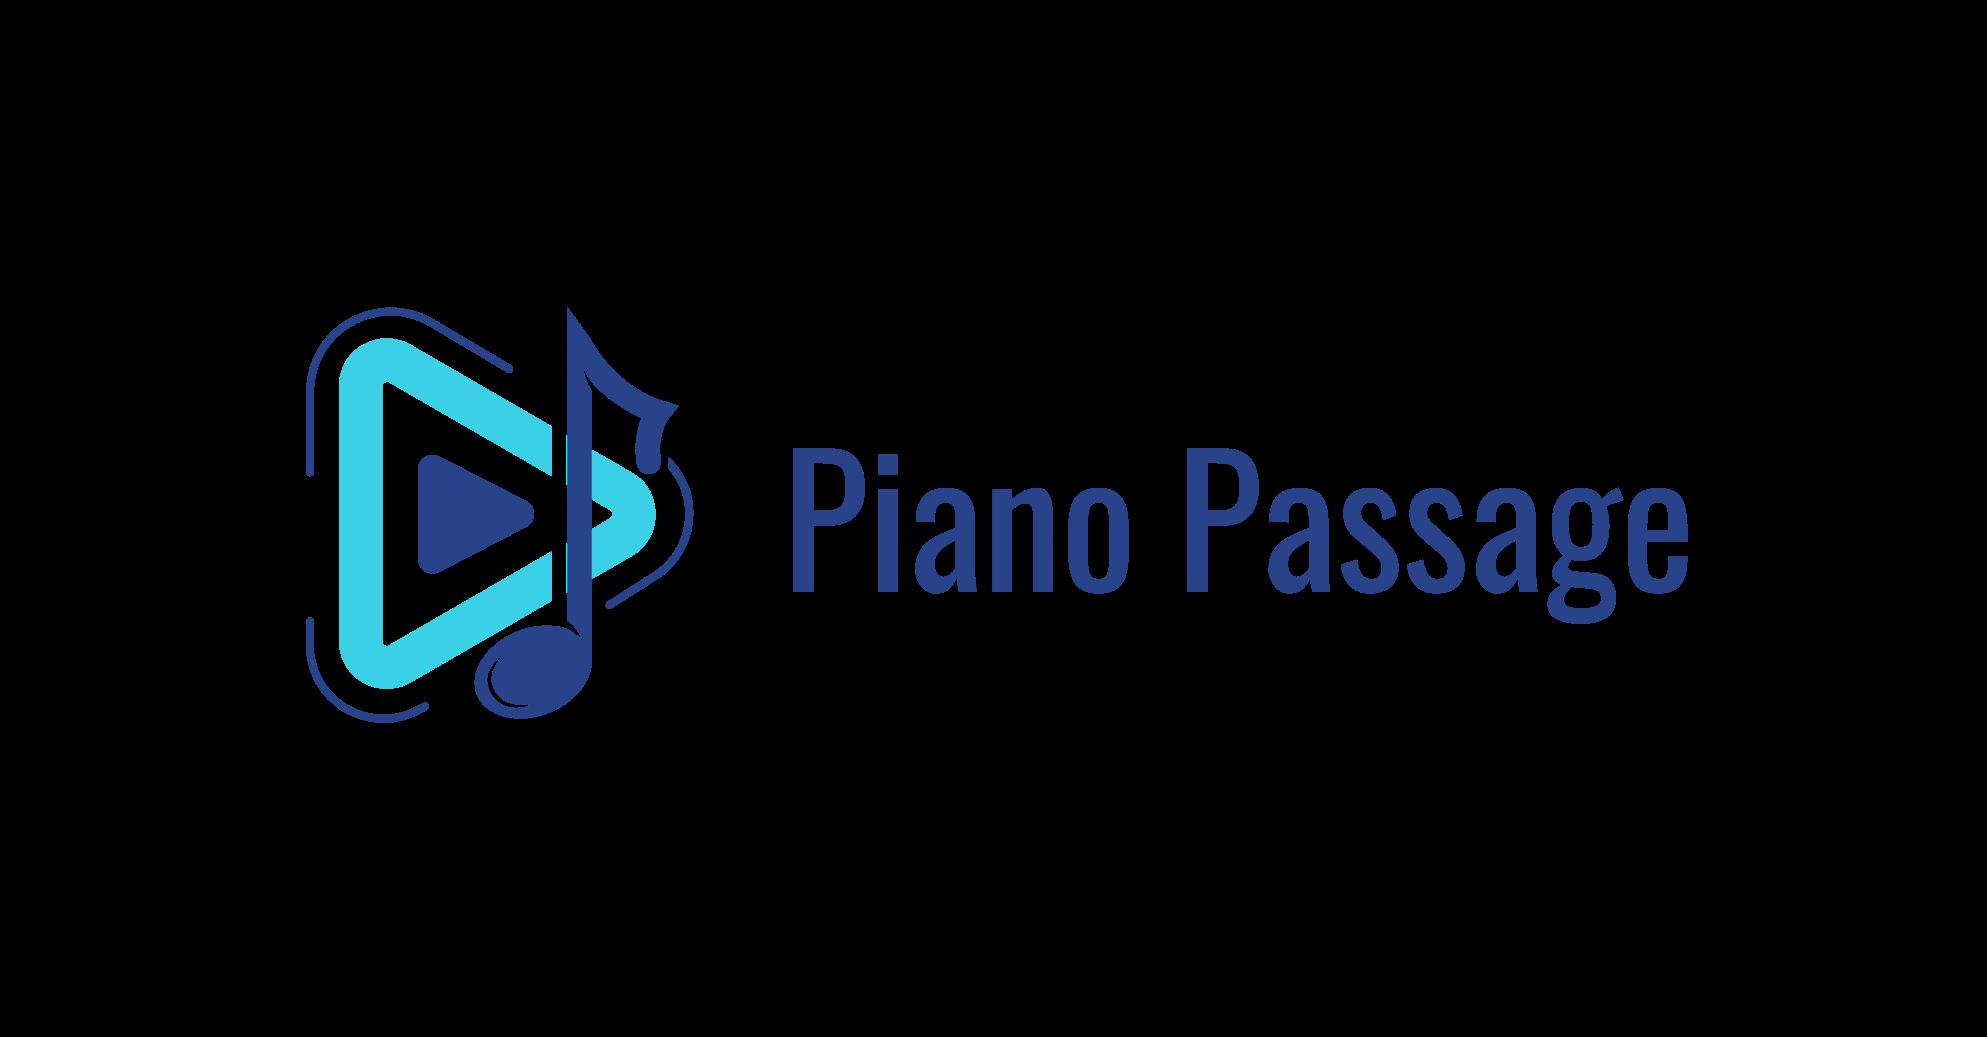 Piano Passage